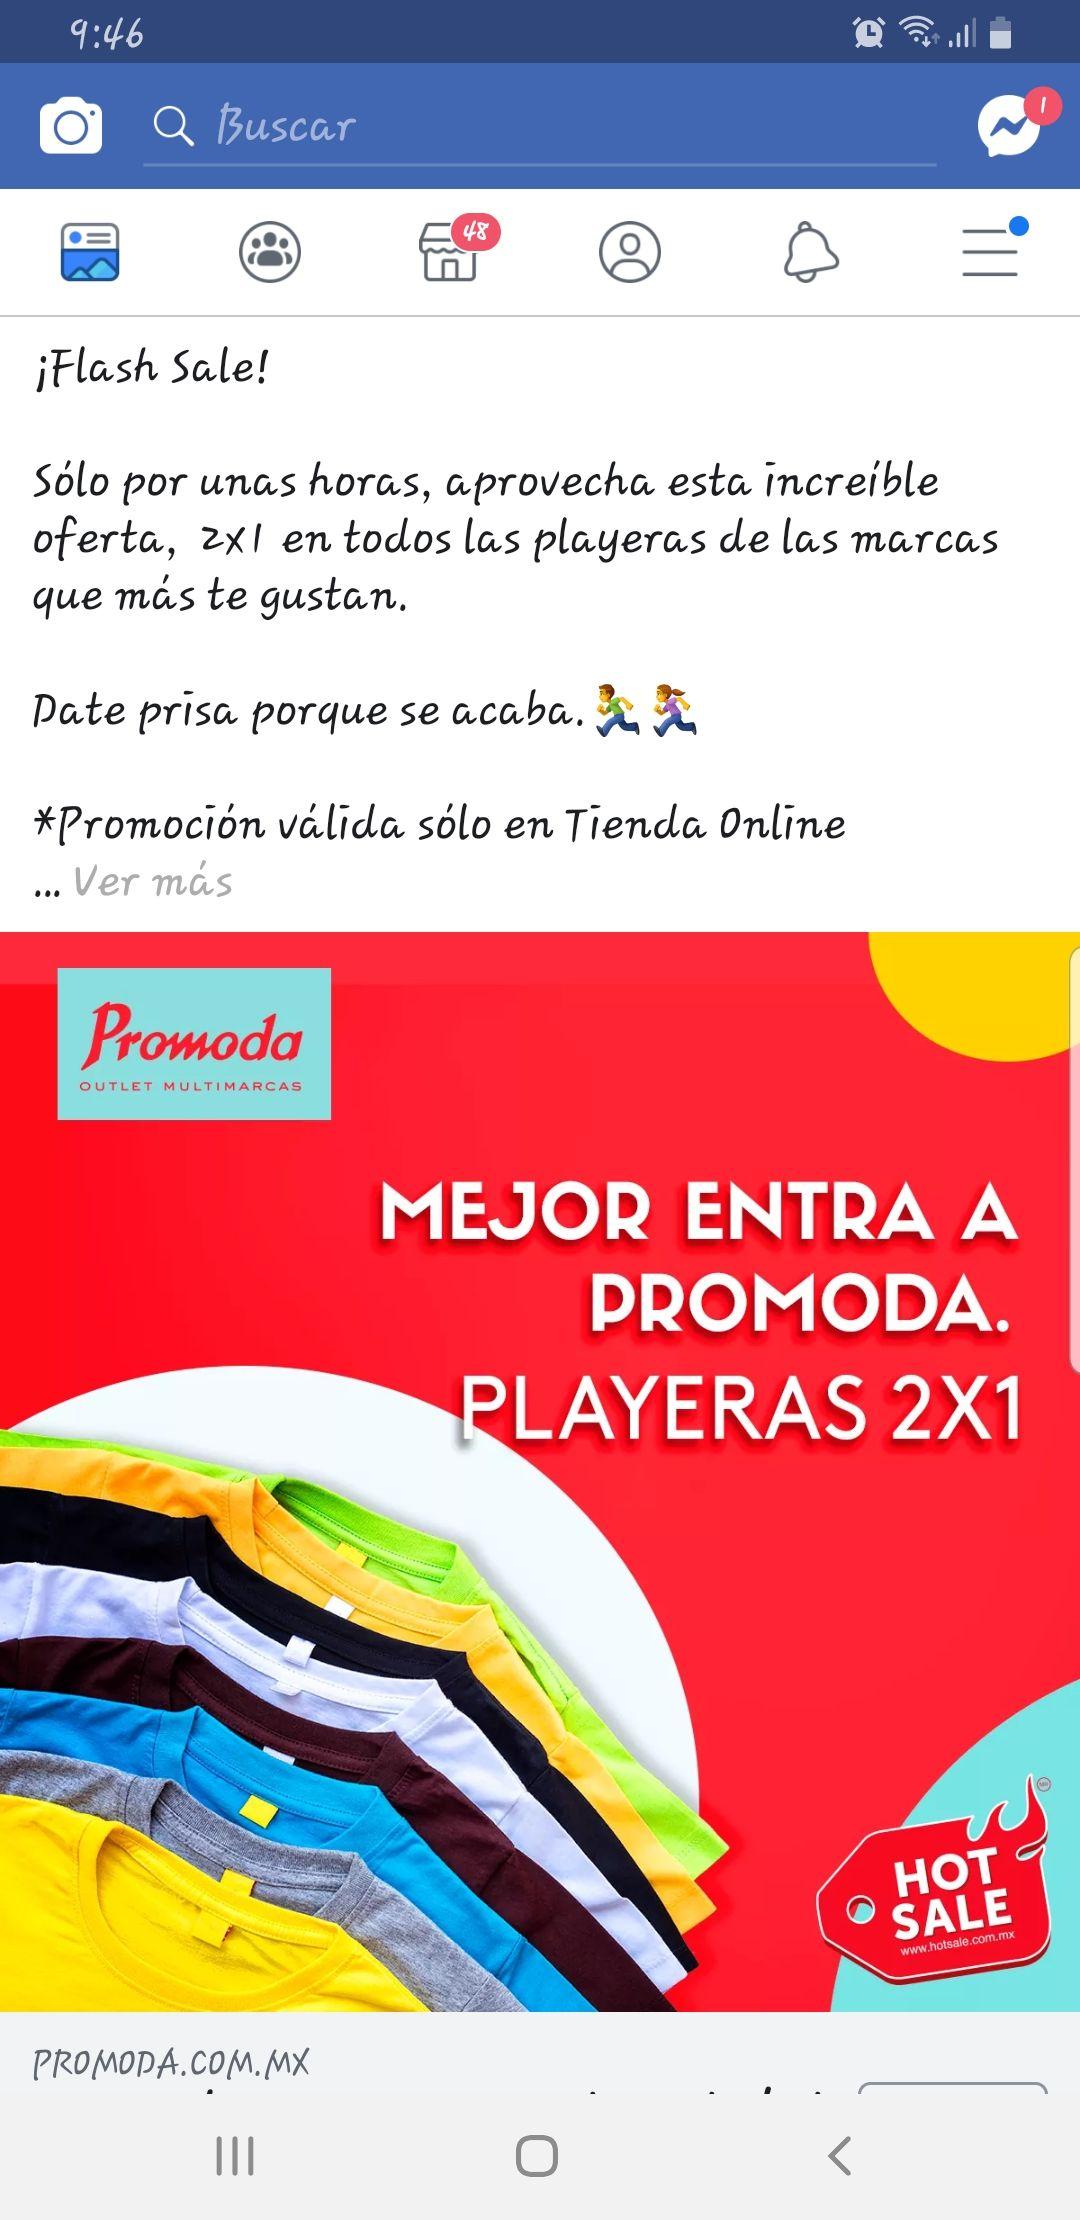 Promoda: playeras 2x1